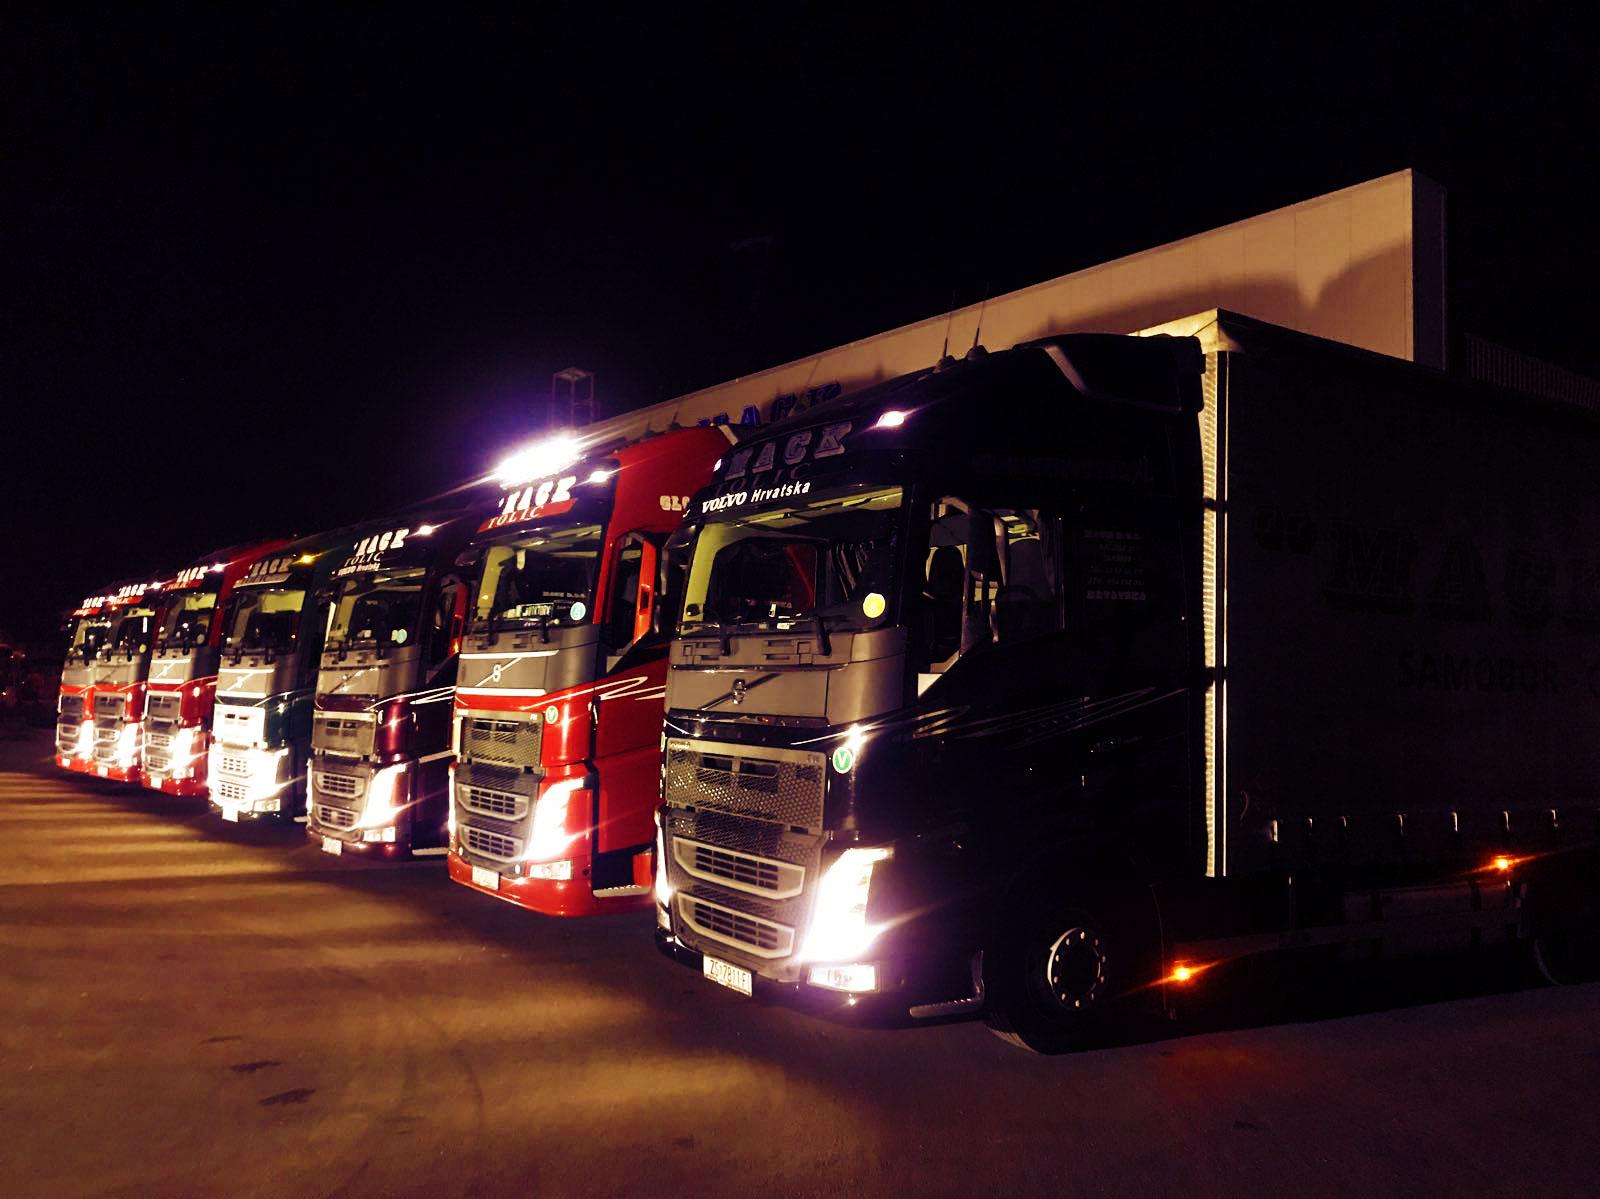 MACK d.o.o. night trucks